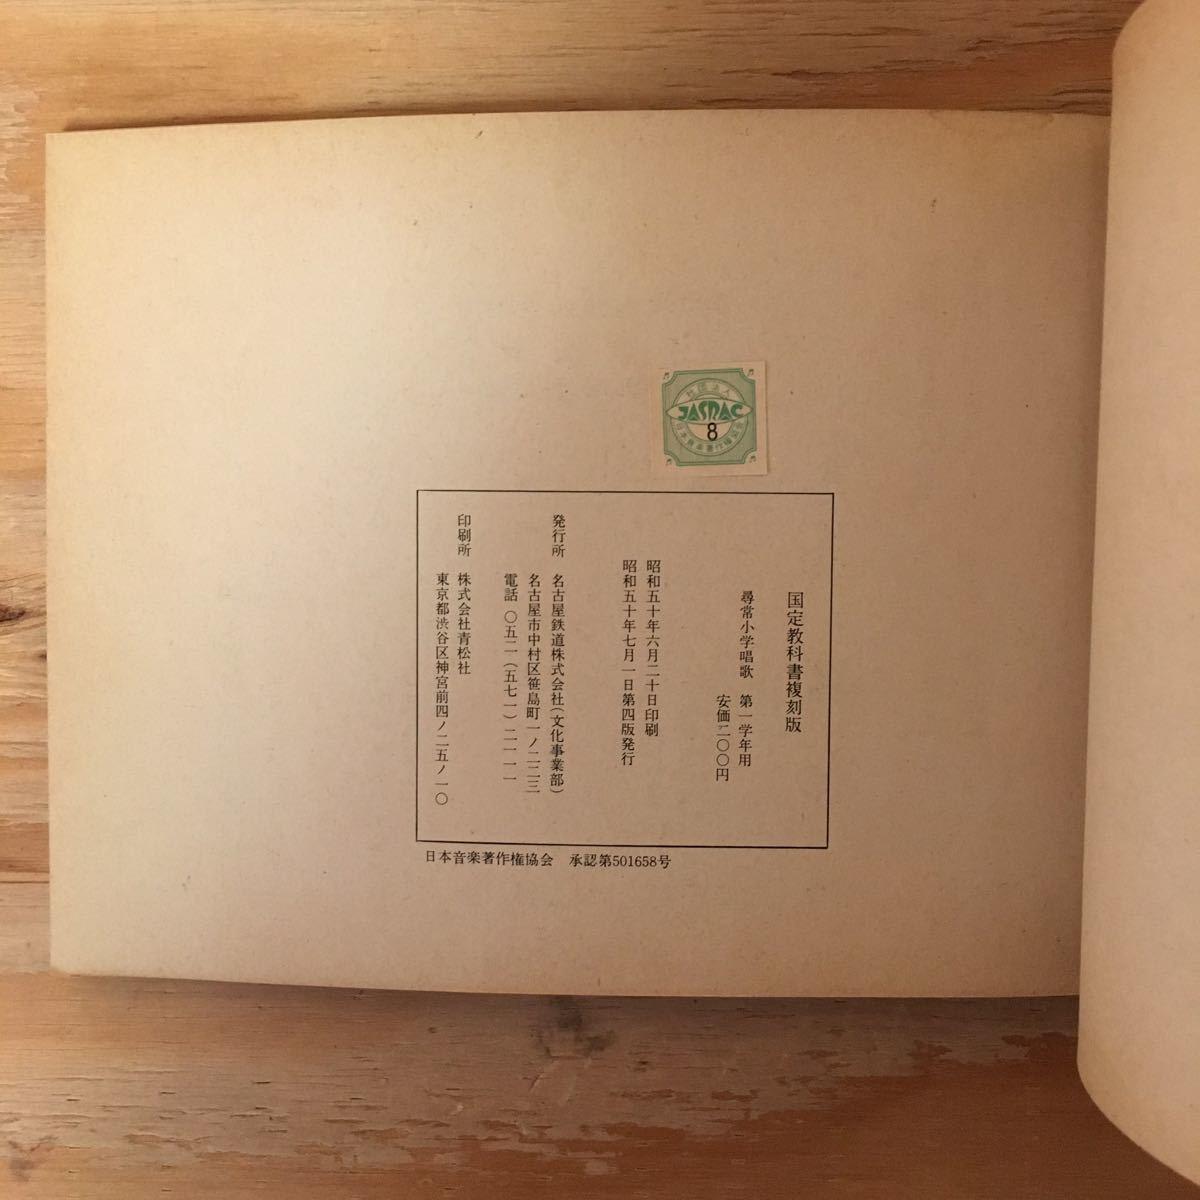 Y3FHHB-200311 レア[第二期国定教科書復刻版 尋常小学唱歌 第一学年用 文部省]日の丸の旗 牛若丸_画像5